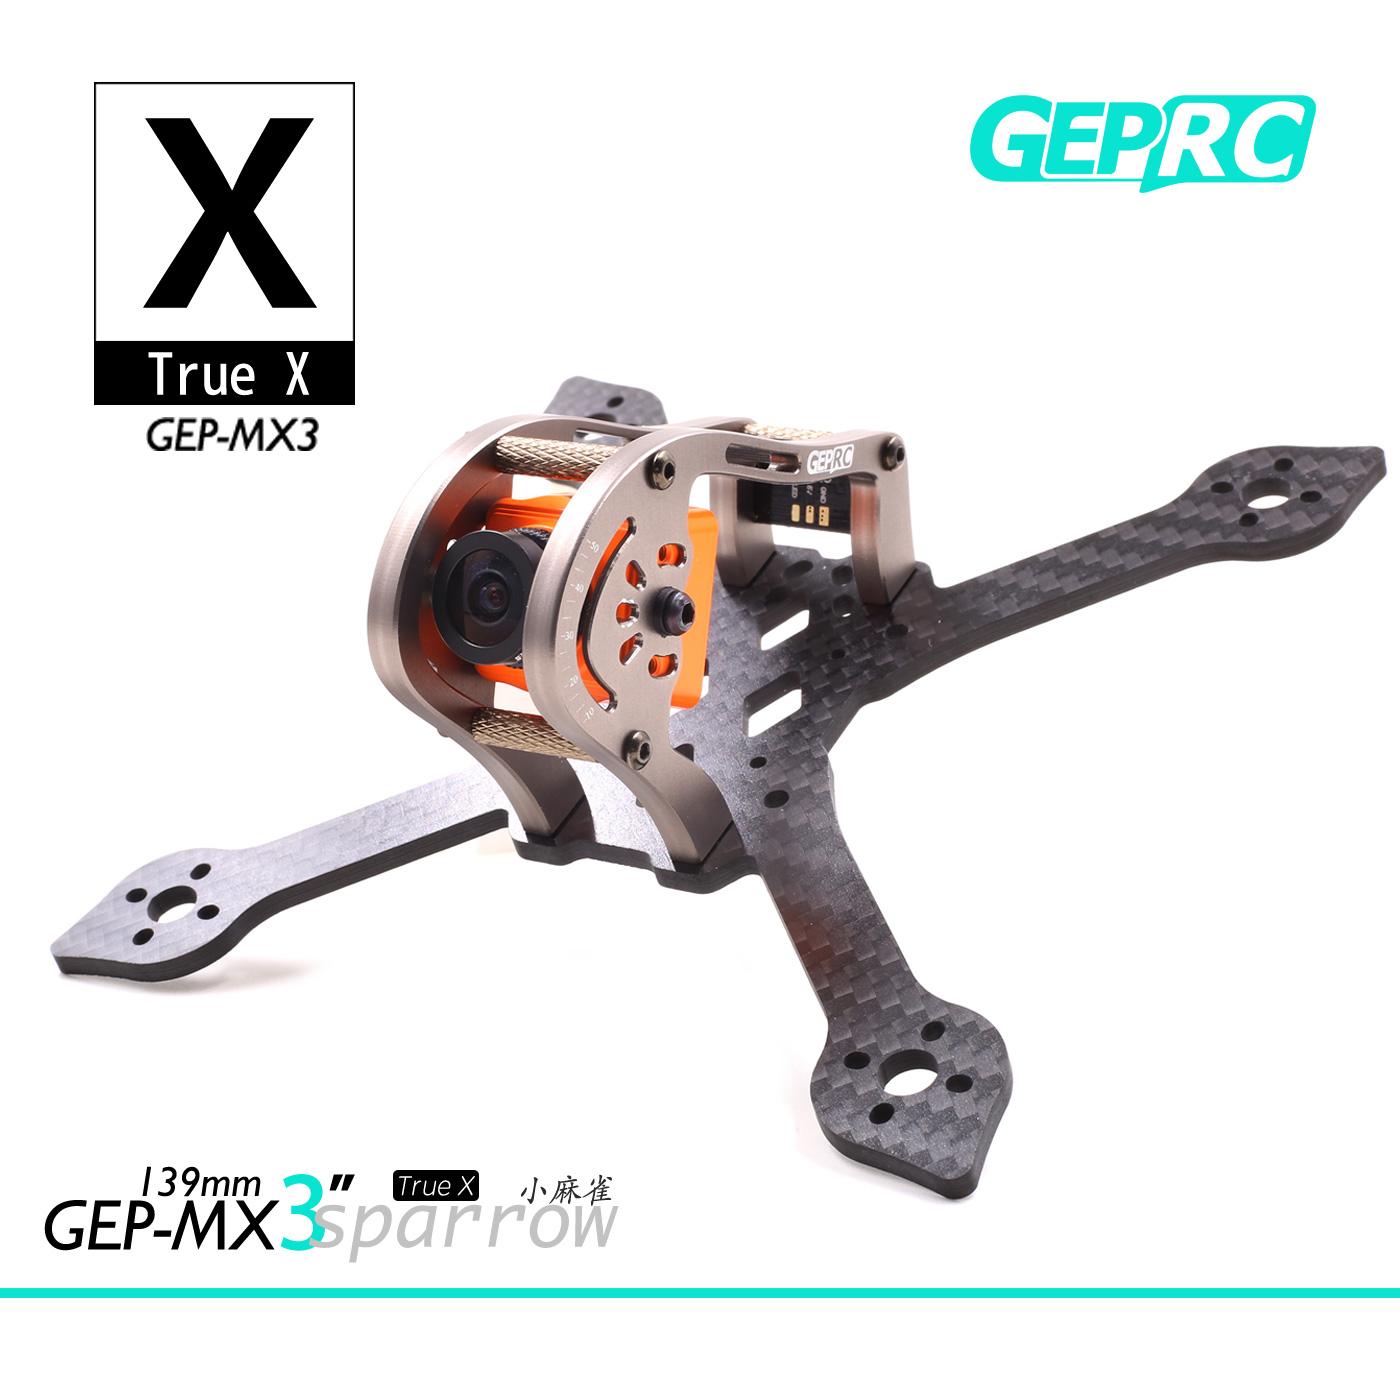 geprc/格普gep-mx3正x 3穿越机